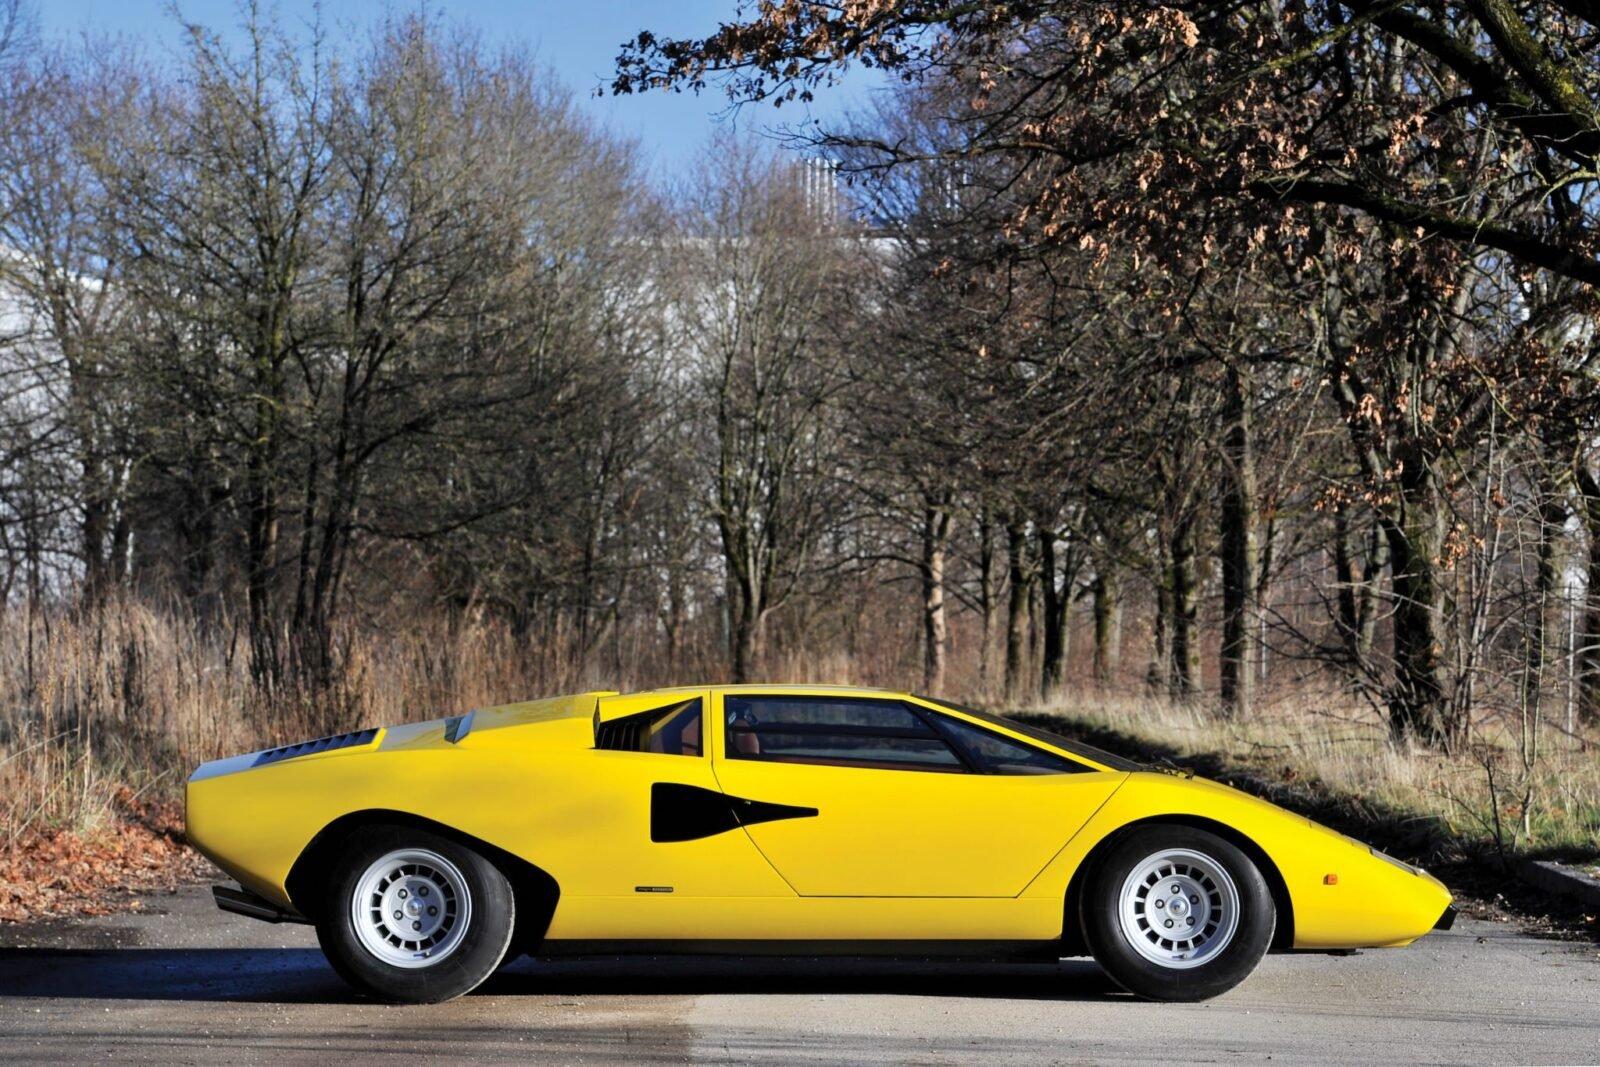 Lamborghini Countach LP400 9 1600x1067 - 1975 Lamborghini Countach LP400 Periscopio